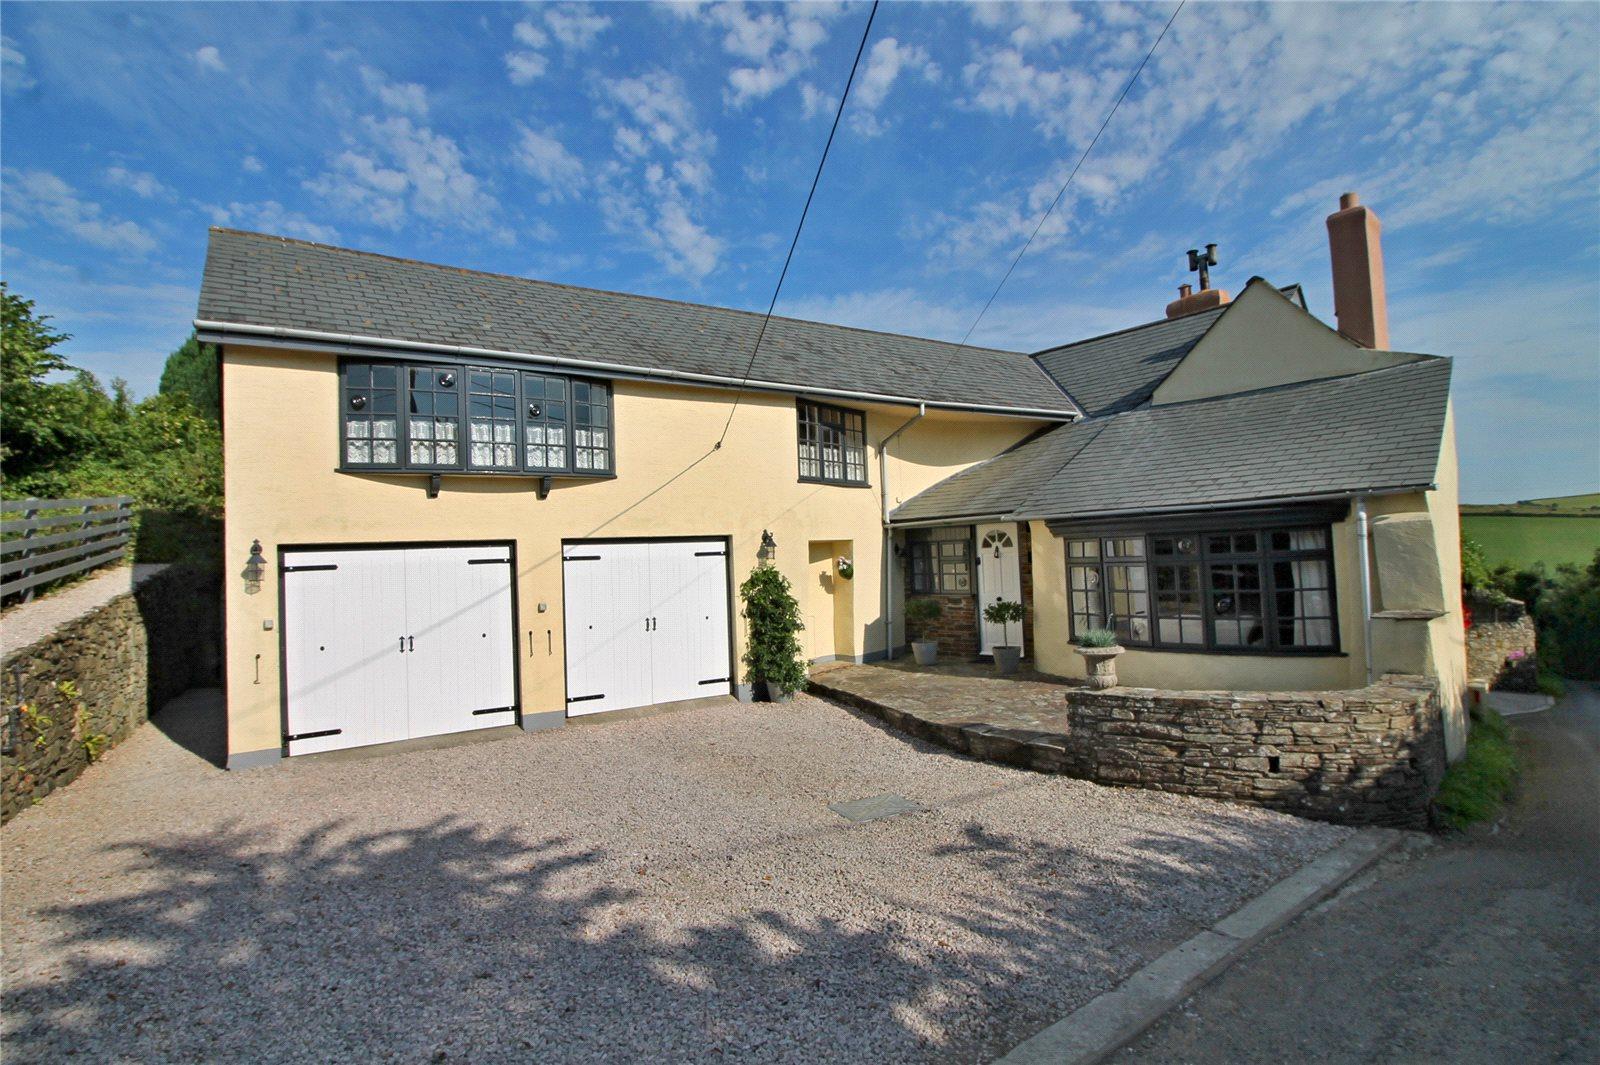 Villa per Vendita alle ore Ford, Kingsbridge, Devon, TQ7 Kingsbridge, Inghilterra